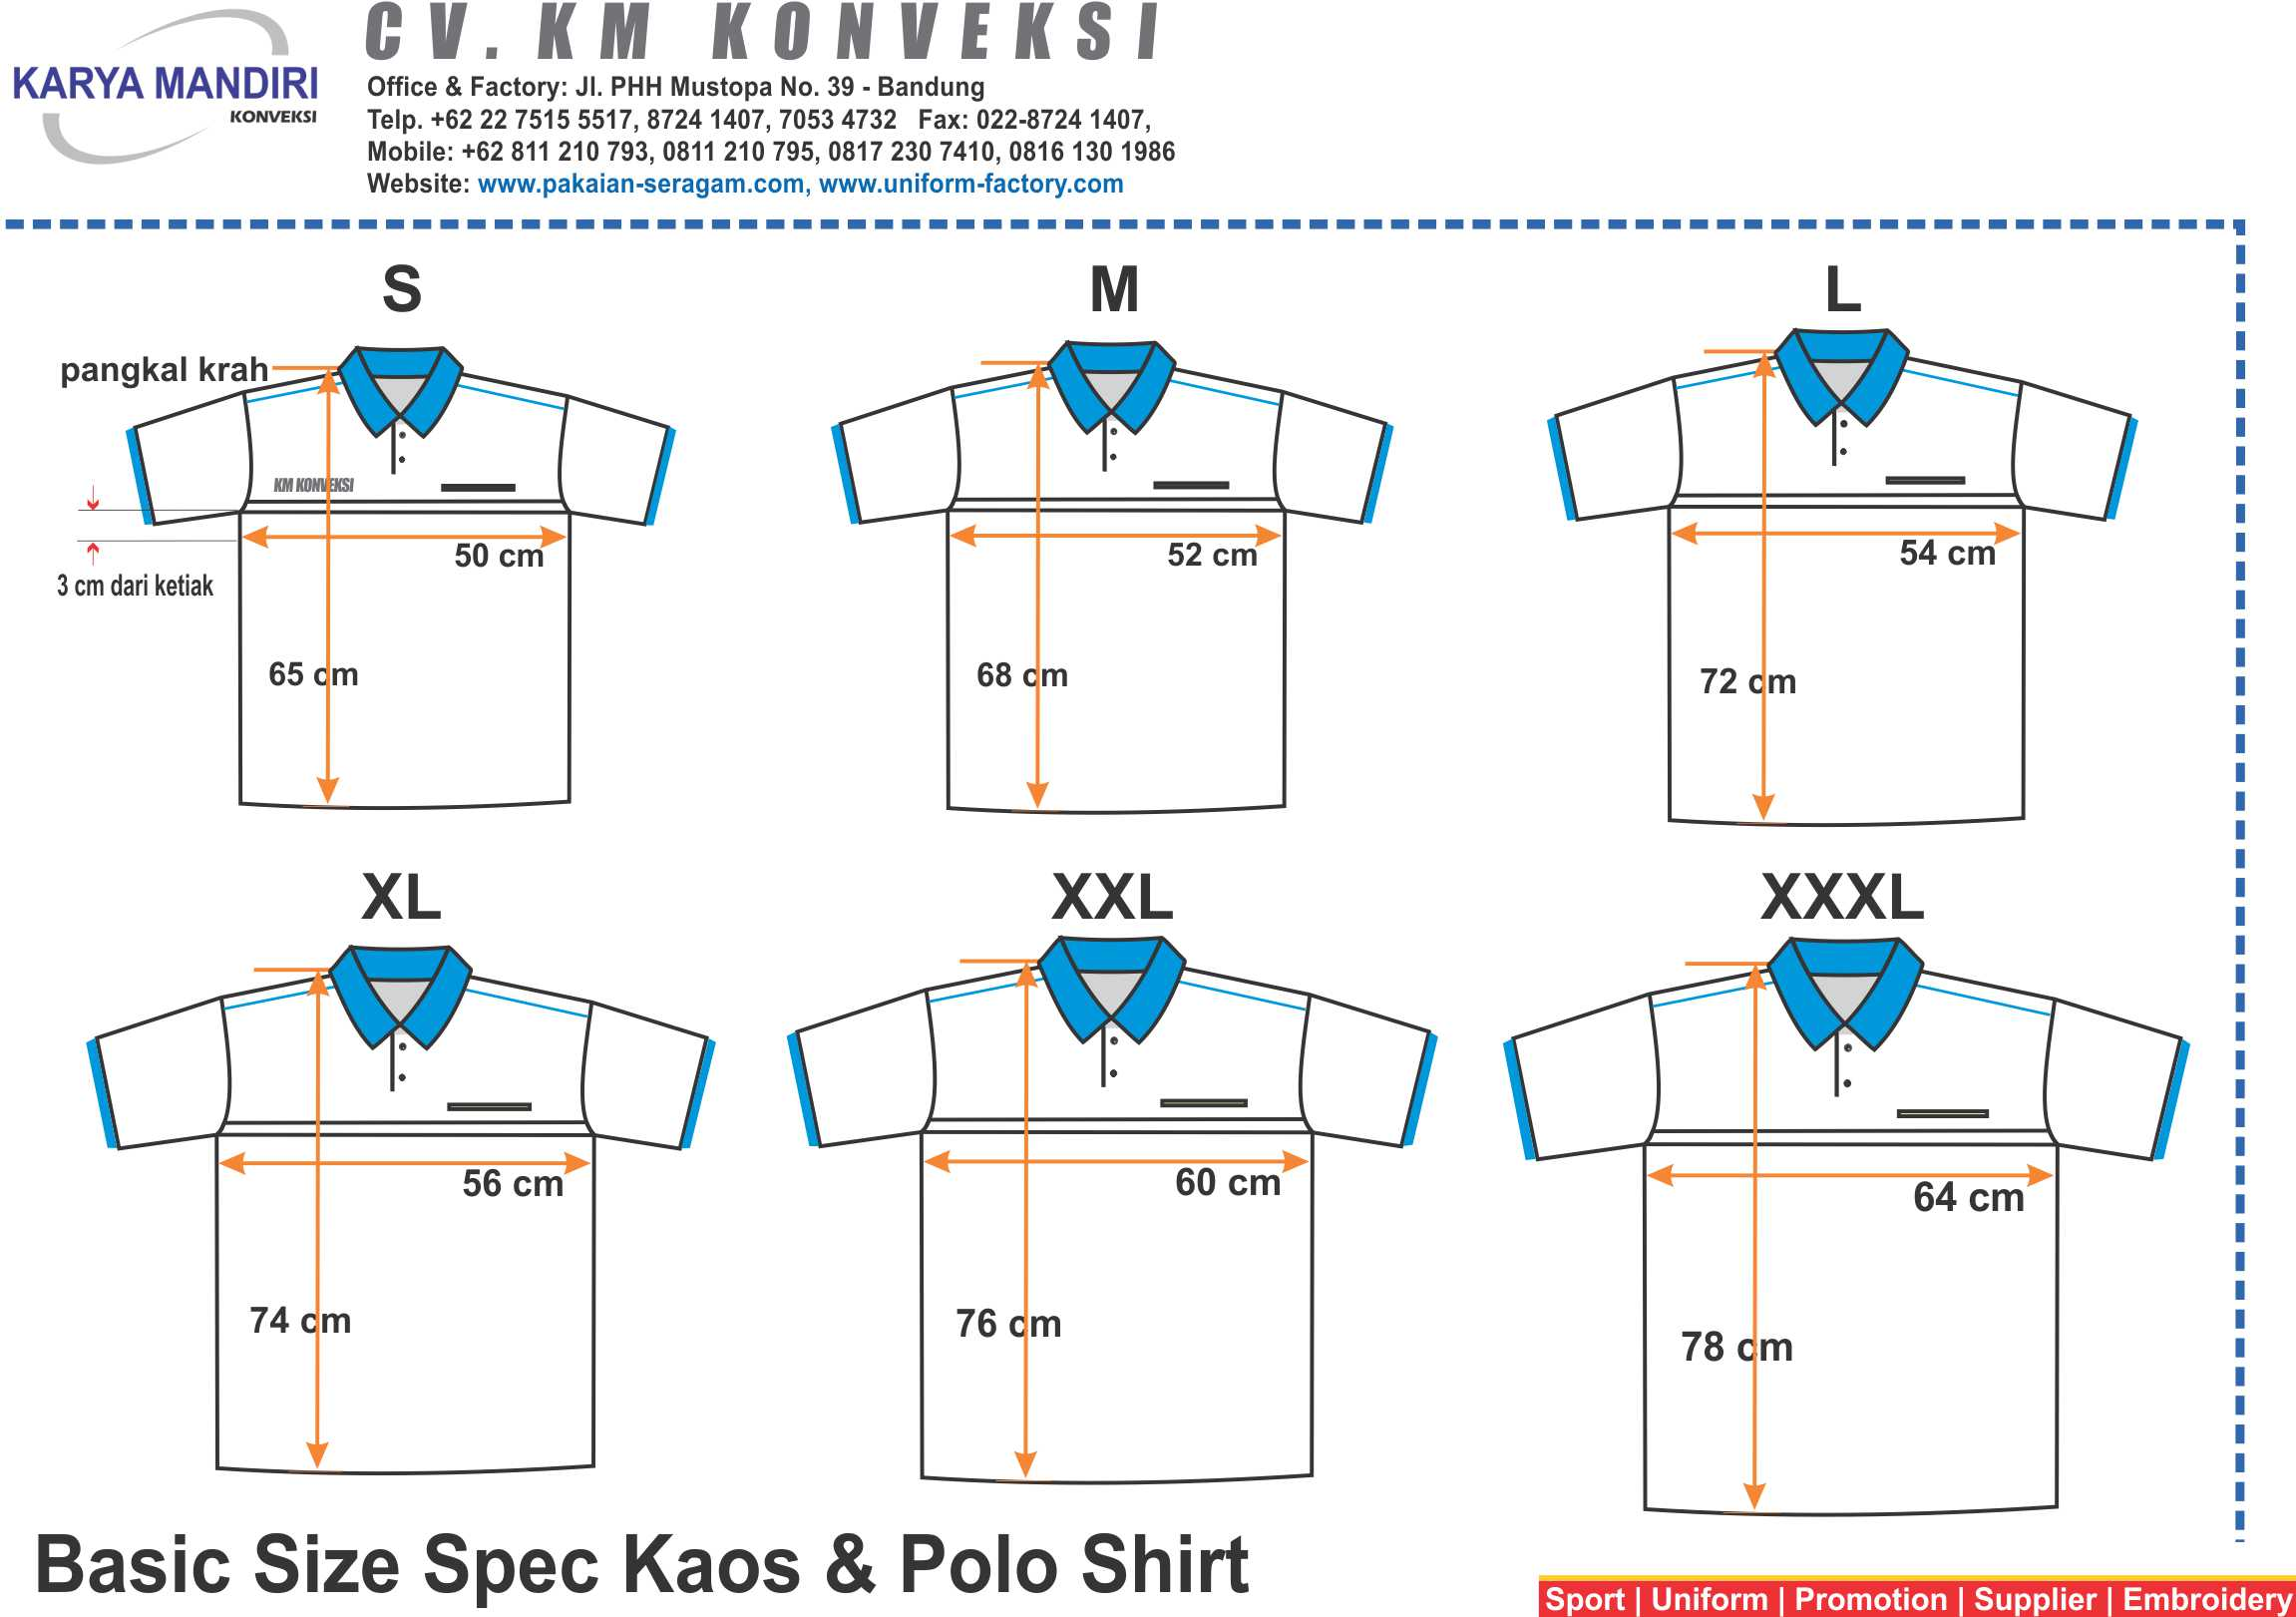 Size Spec Kaos & Polo Shirt